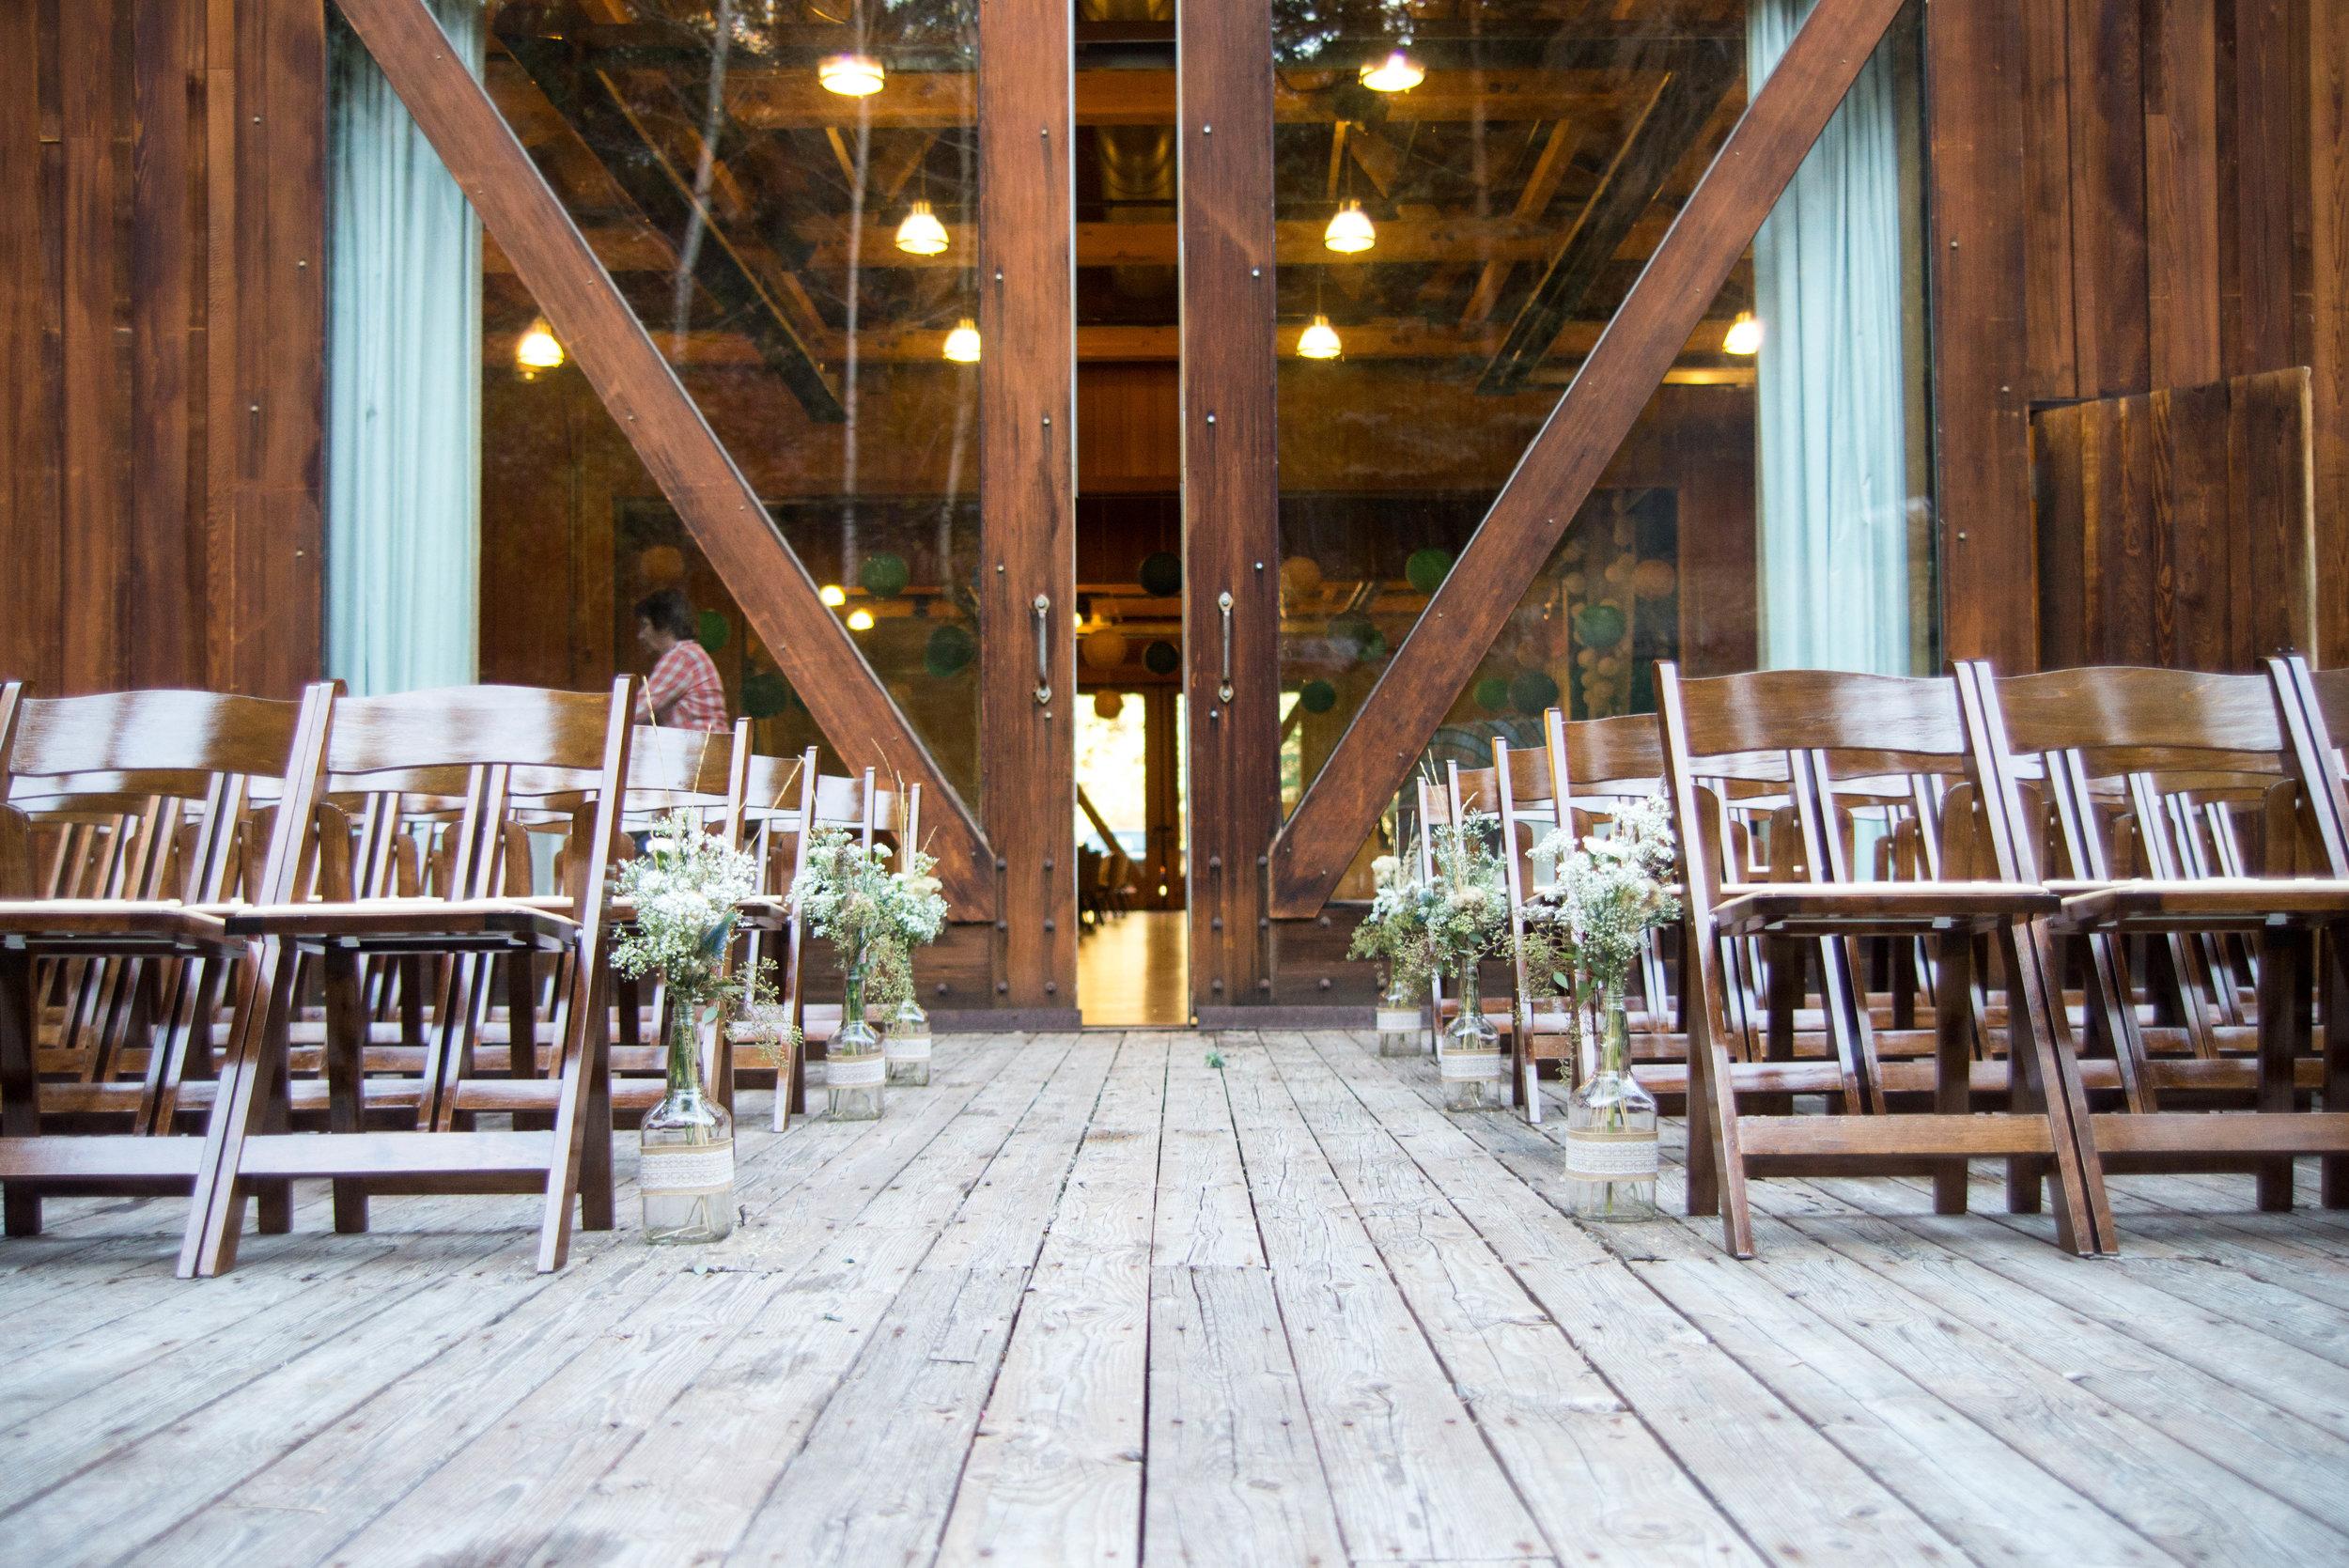 Weddings - $2,700 Full | Engagements + bridals + 5 hour wedding coverage$2,250 Medium | Engagements OR bridals + 5 hour wedding coverage$1,800 Small | 5 hour wedding coverage